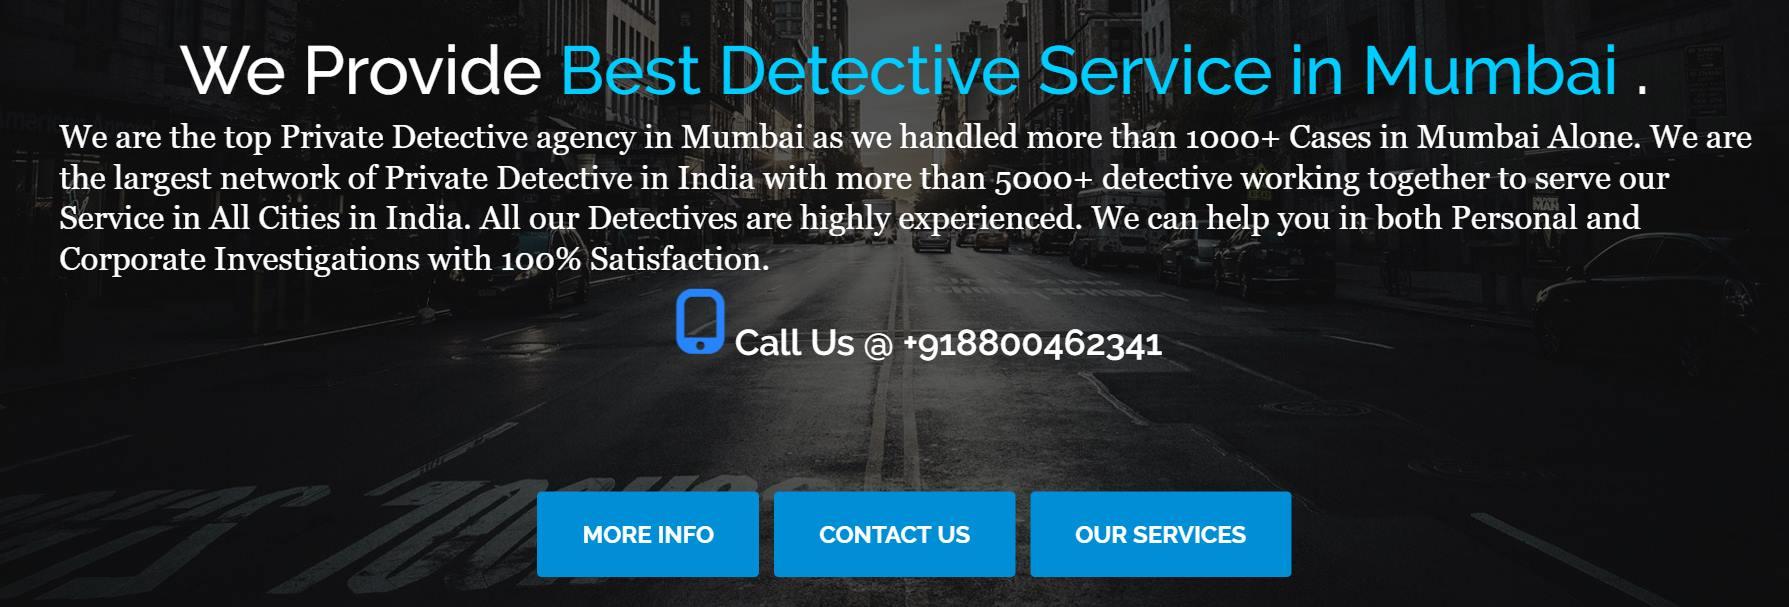 Private Detective Agency Mumbai